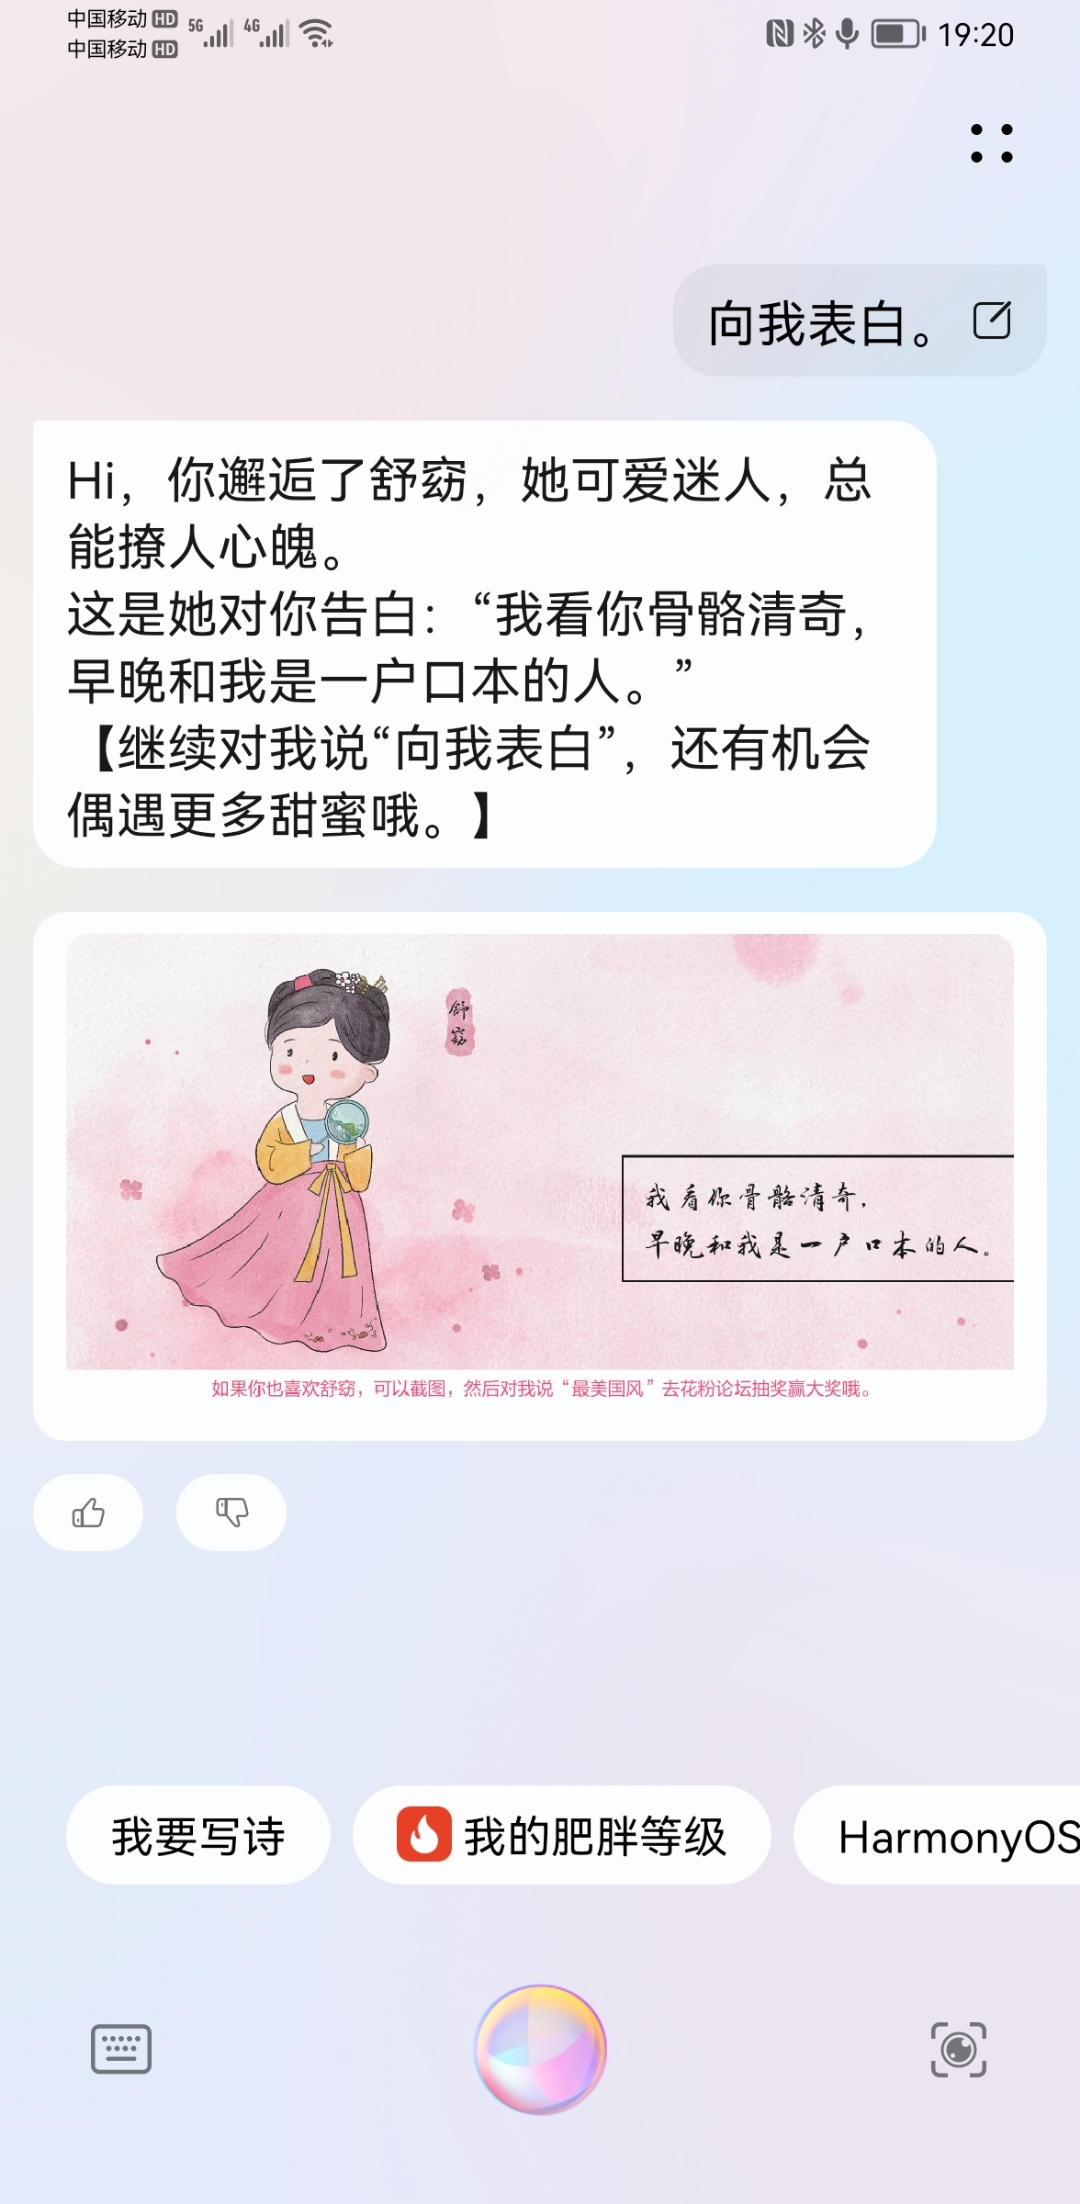 Screenshot_20210611_192019_com.huawei.vassistant.jpg